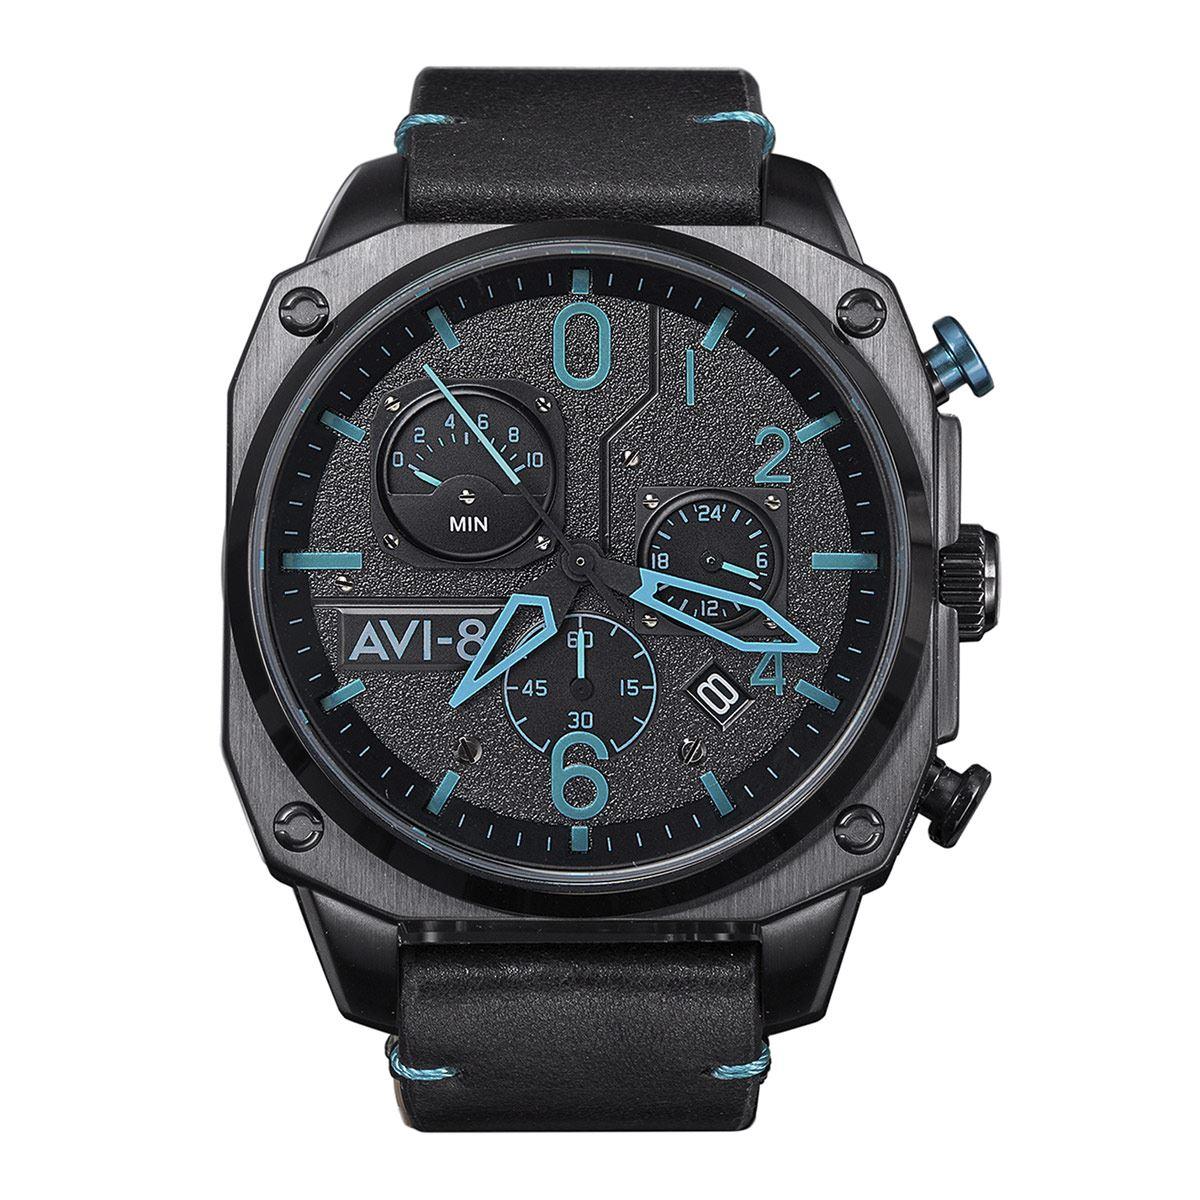 Reloj Avi-8 Av405205 para Caballero Color Negro